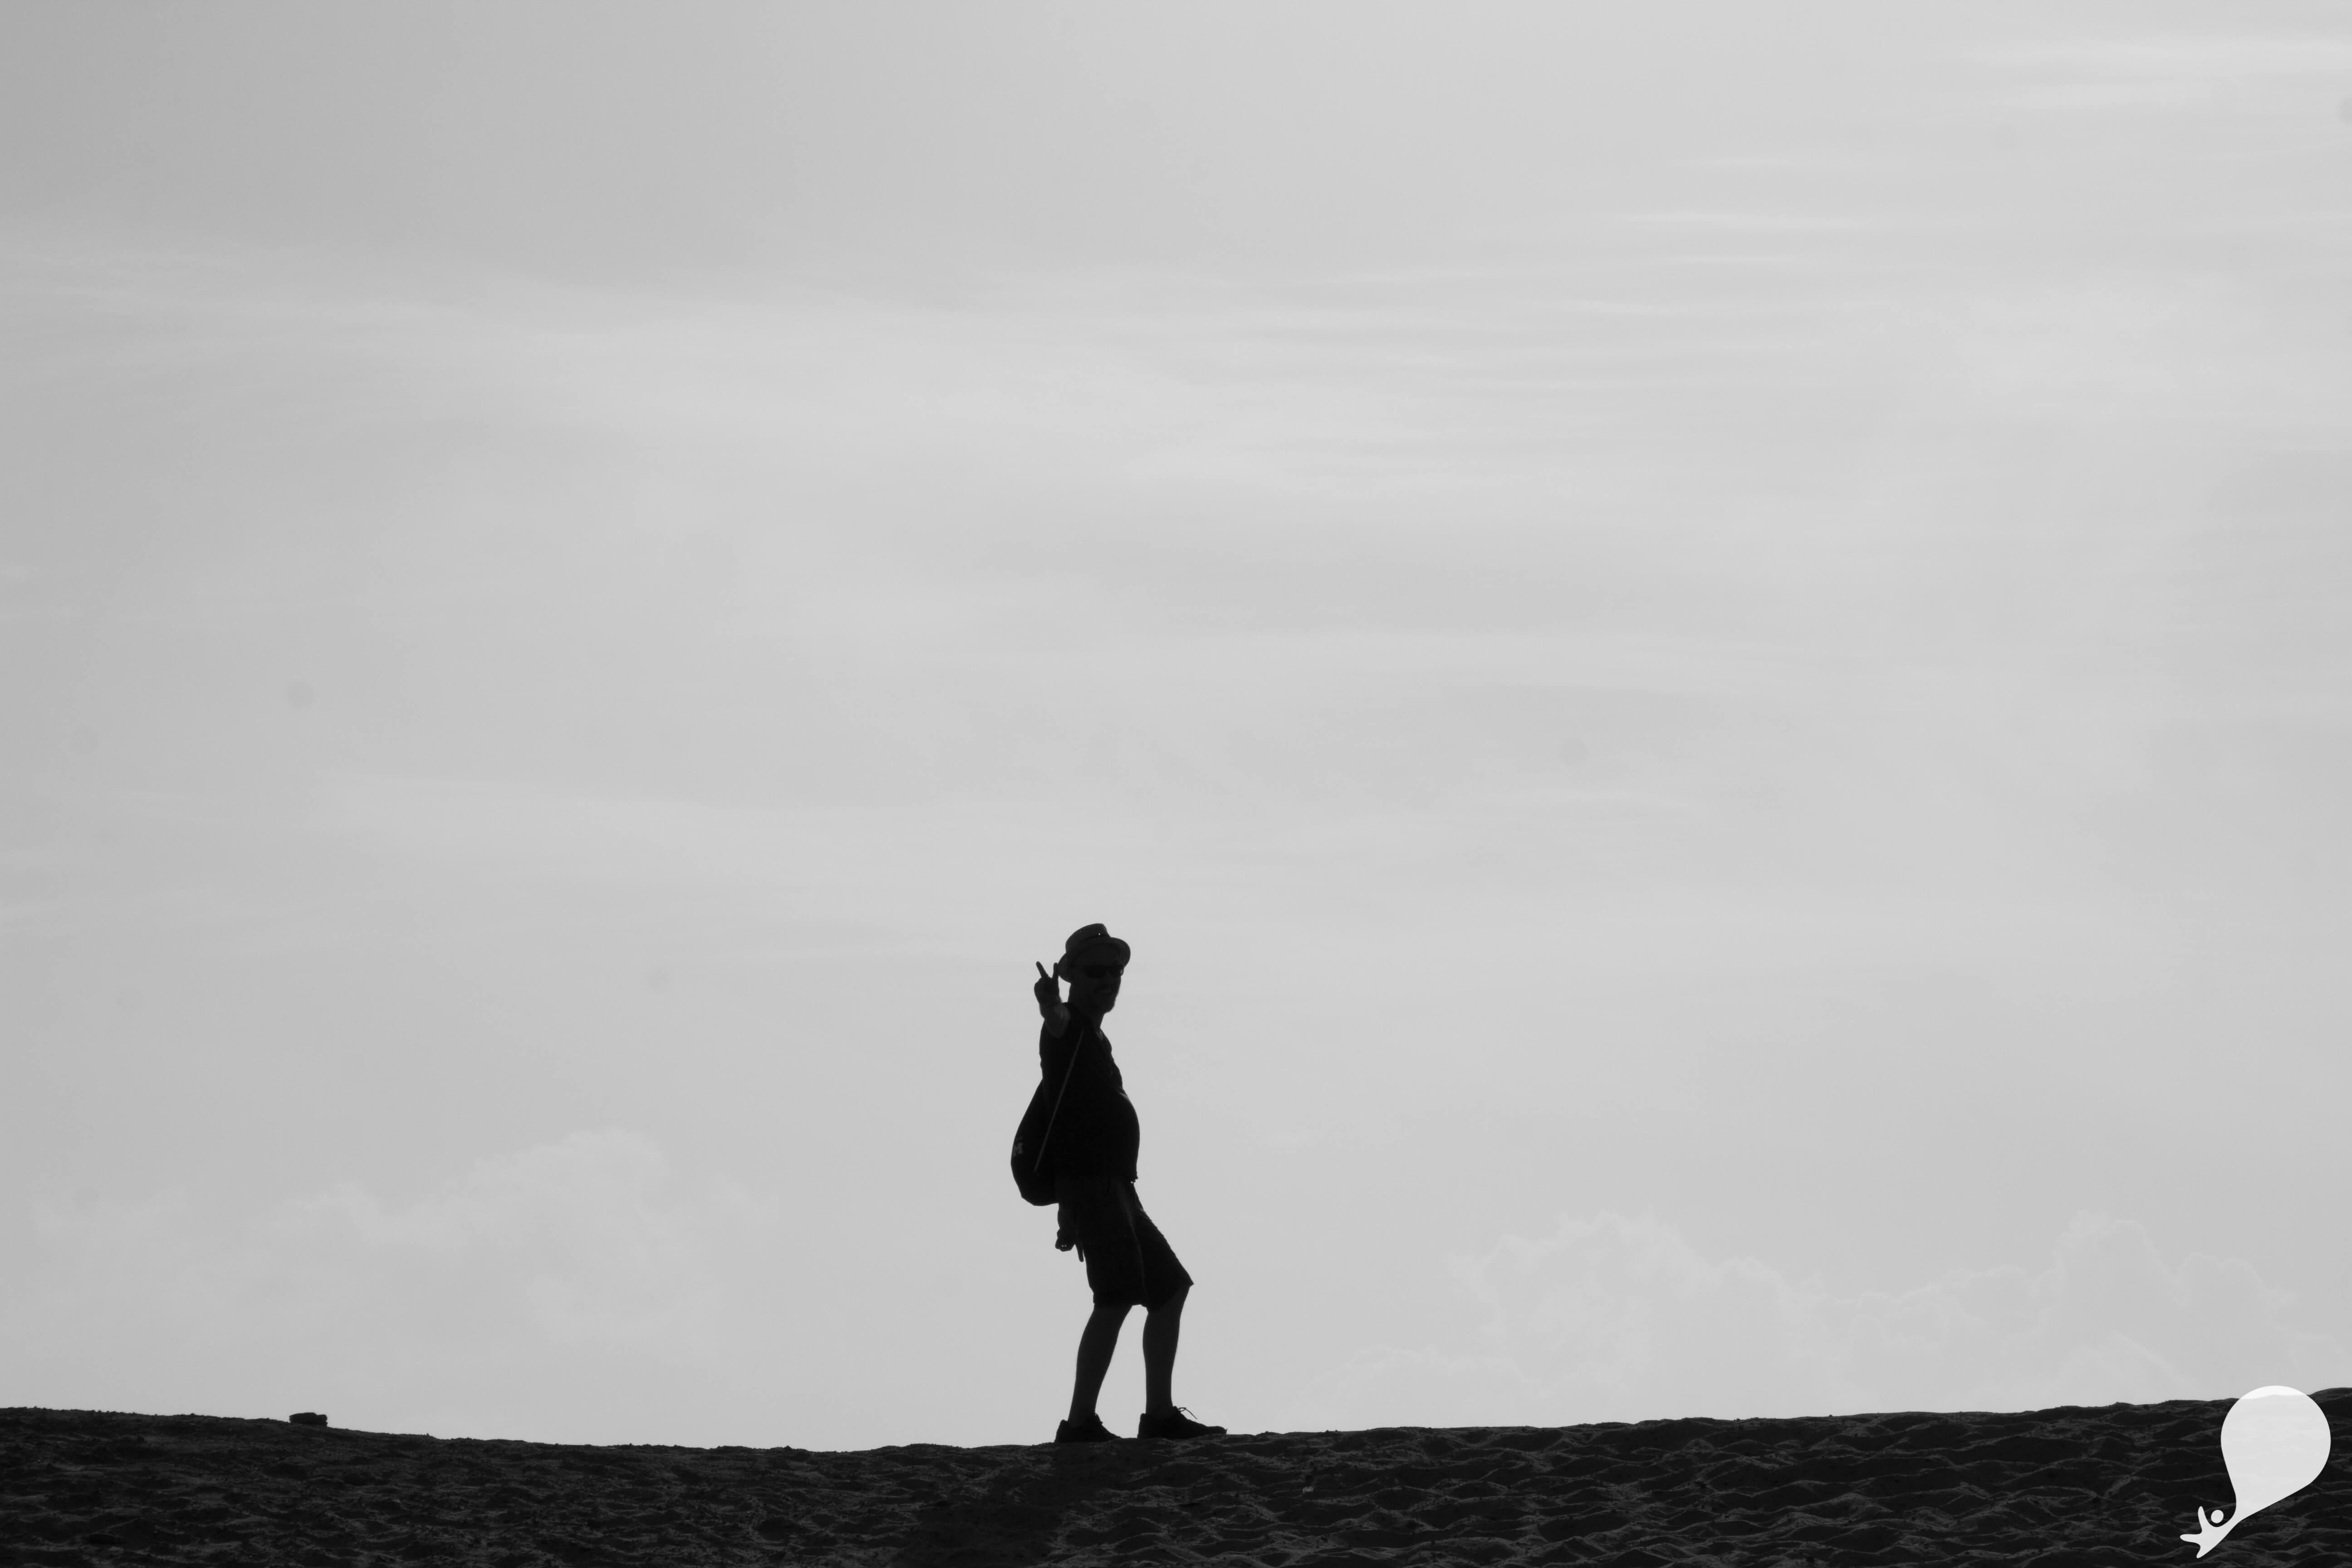 dahab-explore-travel-travelphotography-reisefreiheit-eu